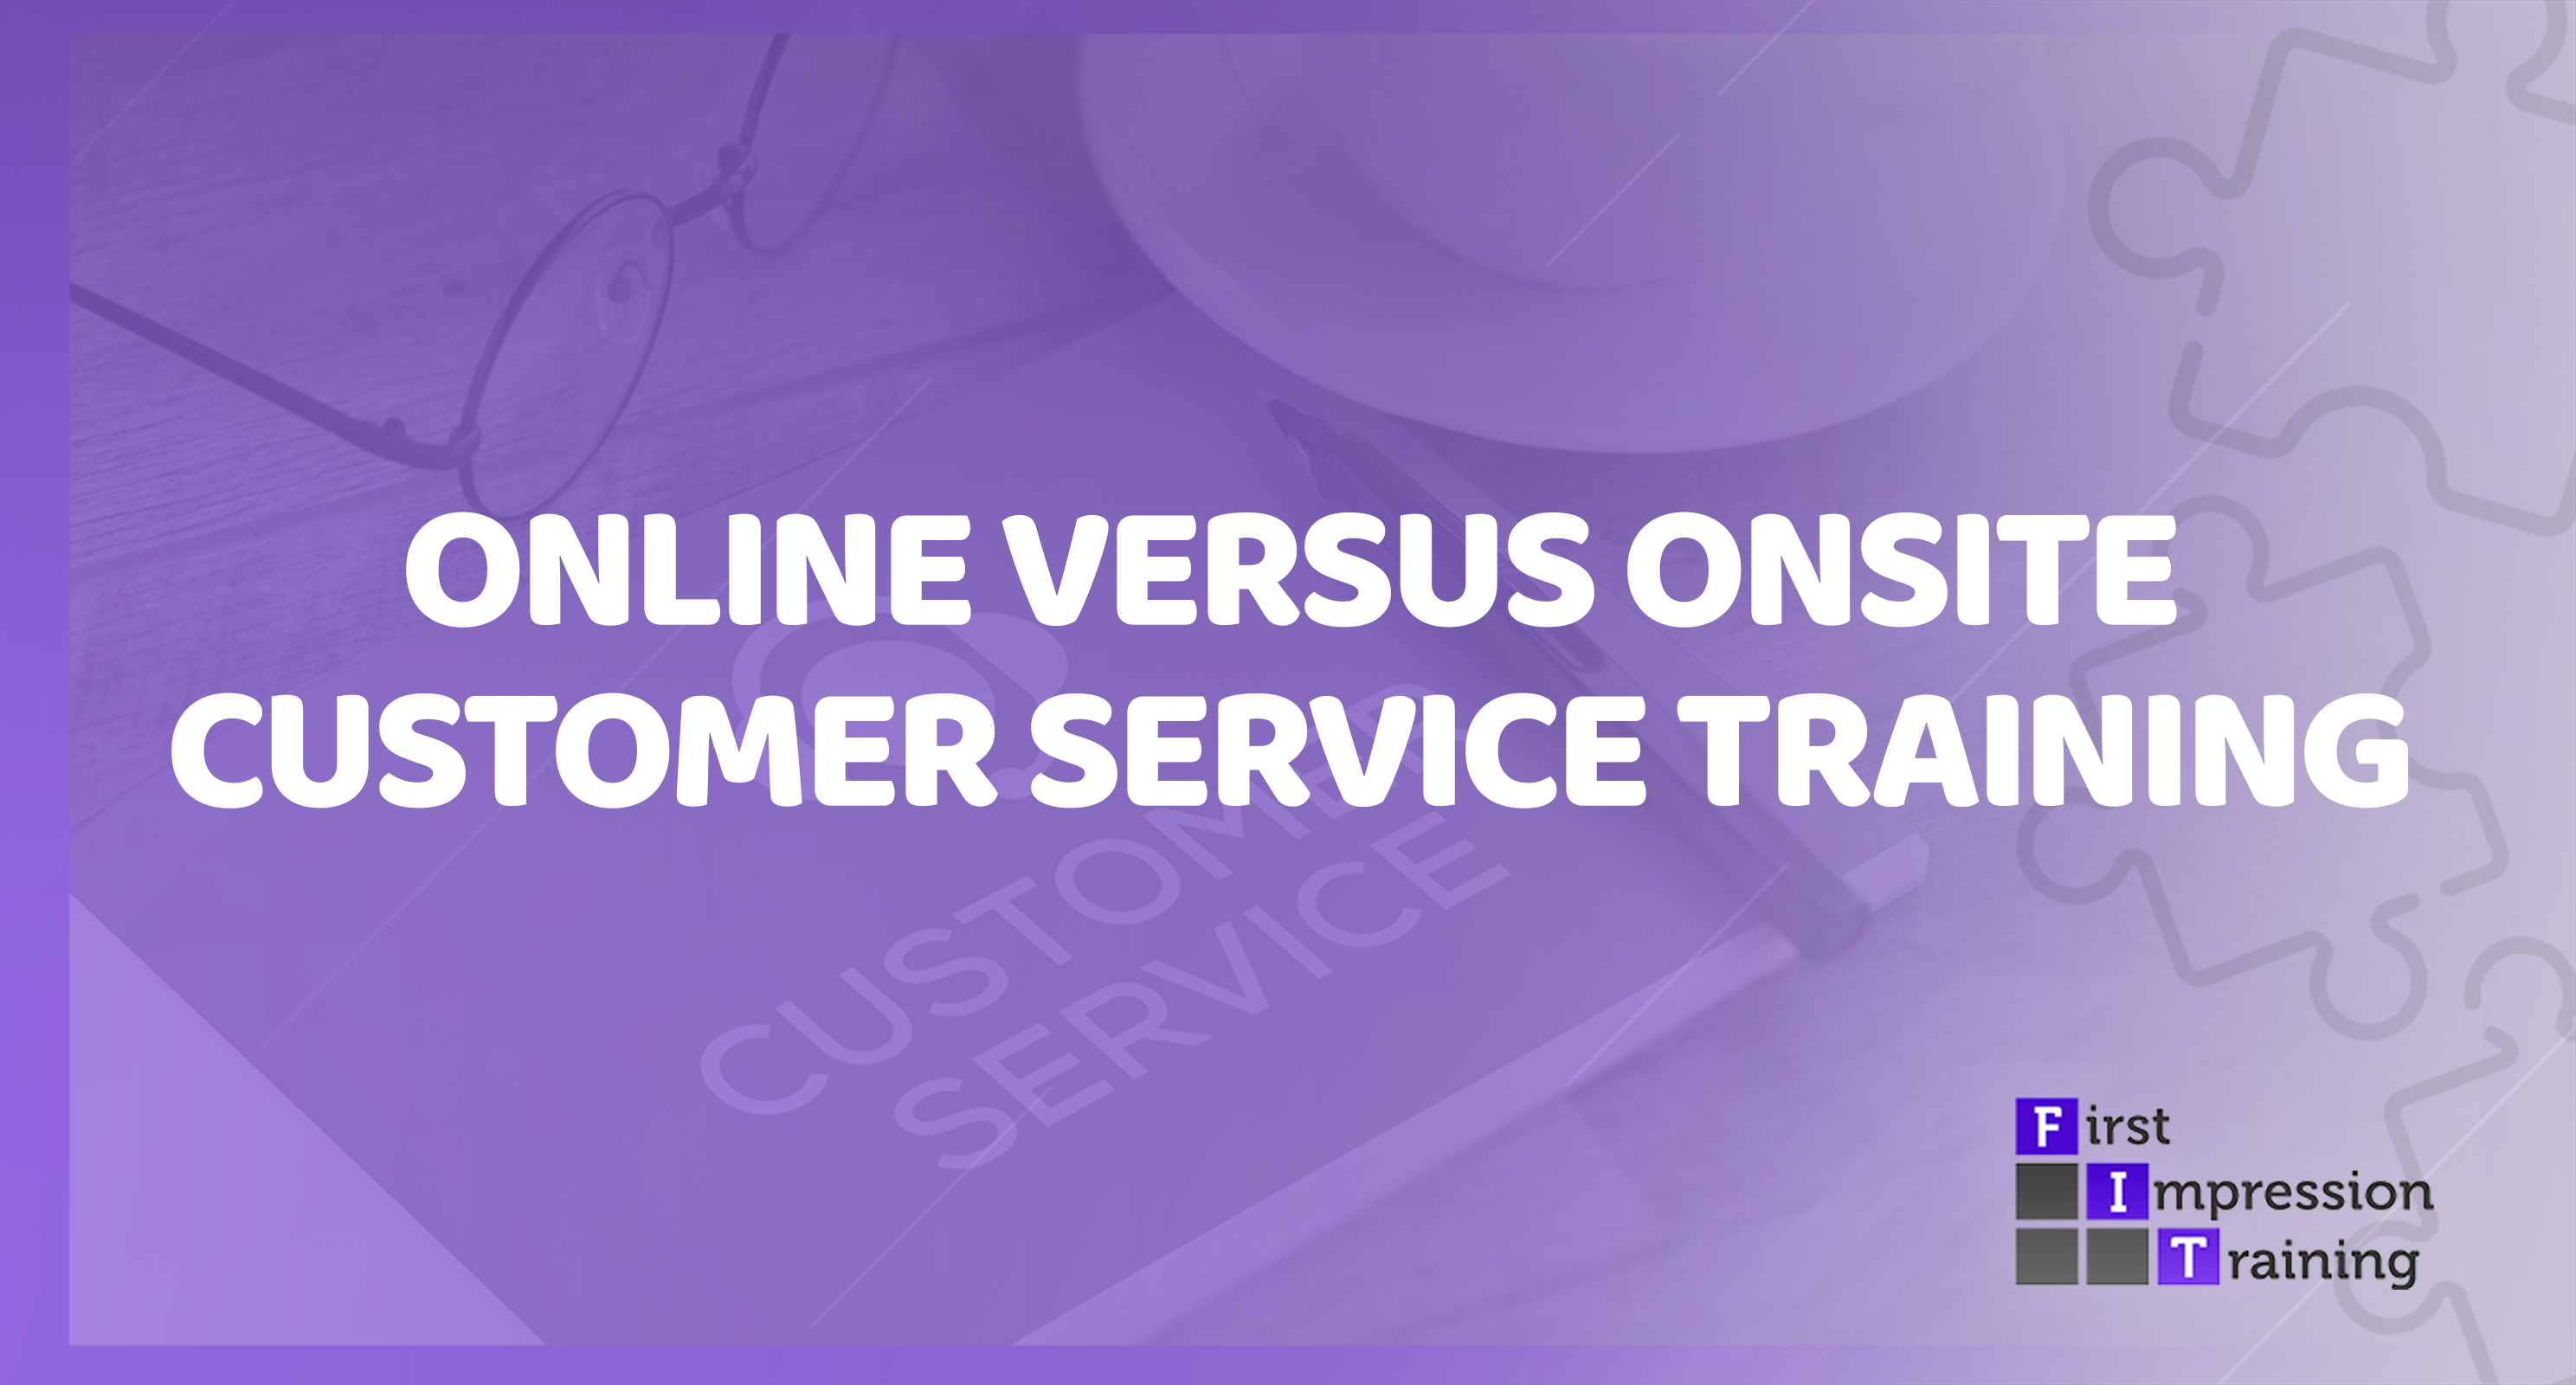 Online Customer Service Training VERSUS Onsite Customer Service Training